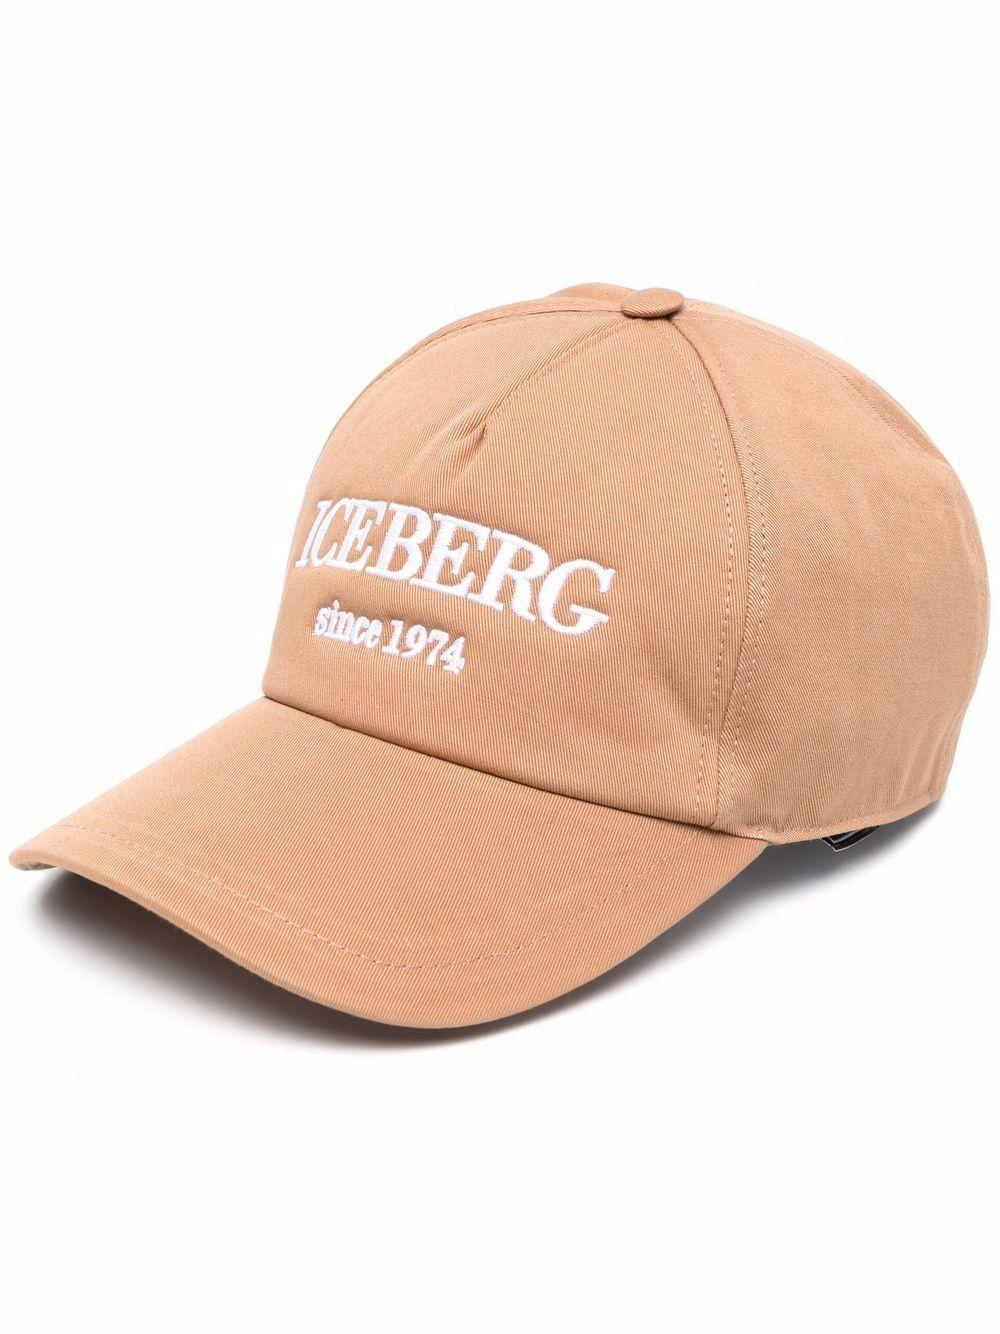 Iceberg cappelli cammello